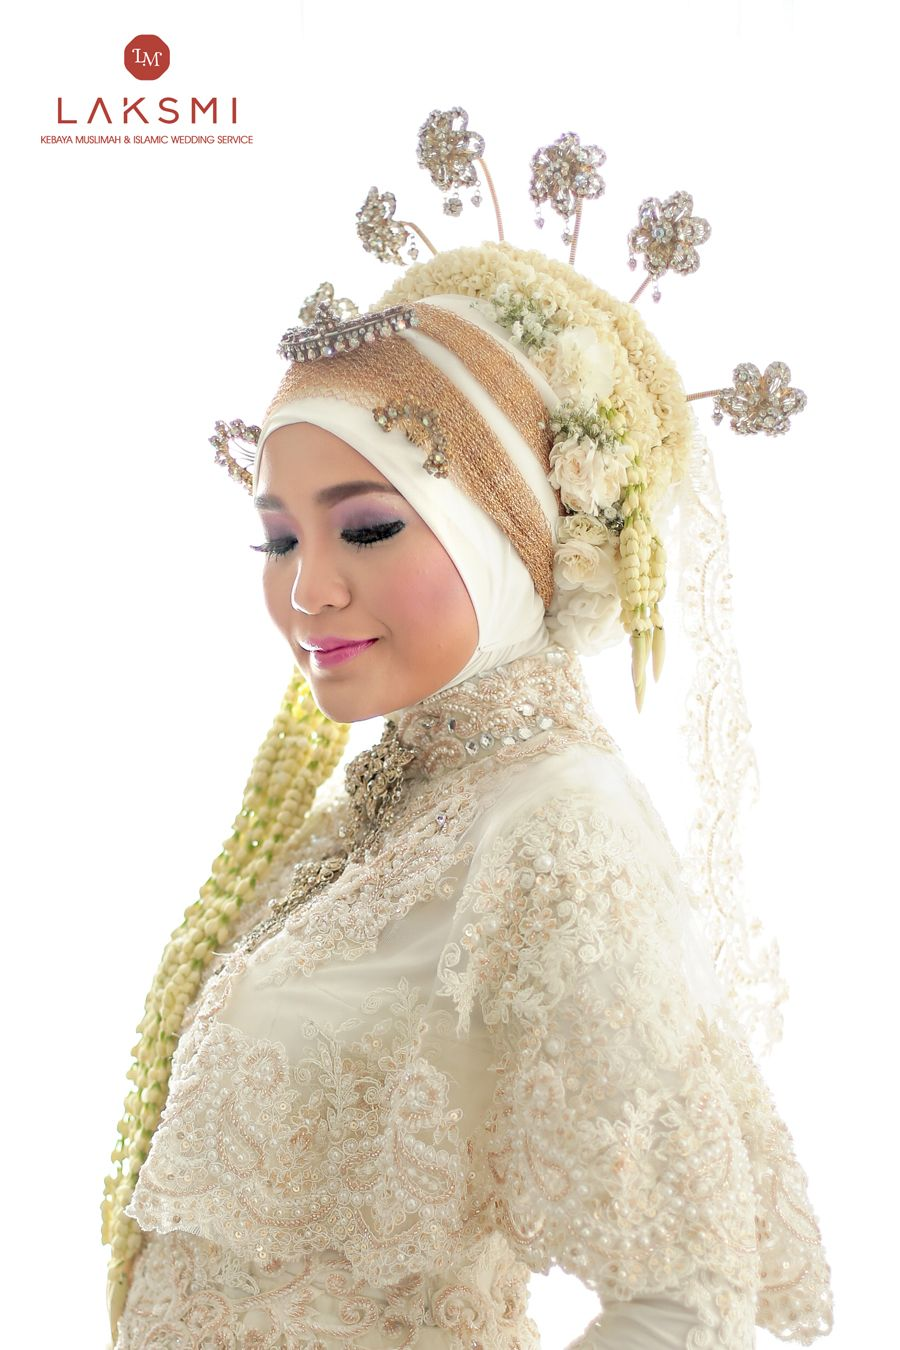 Akad Nikah Menjadi Moment Sakral Yang Akan Selalu Terkenang Sepanjang Kehidupan Atika Memilih Kebaya Akad Nikah Be Pengantin Wanita Pengantin Pengantin Muslim